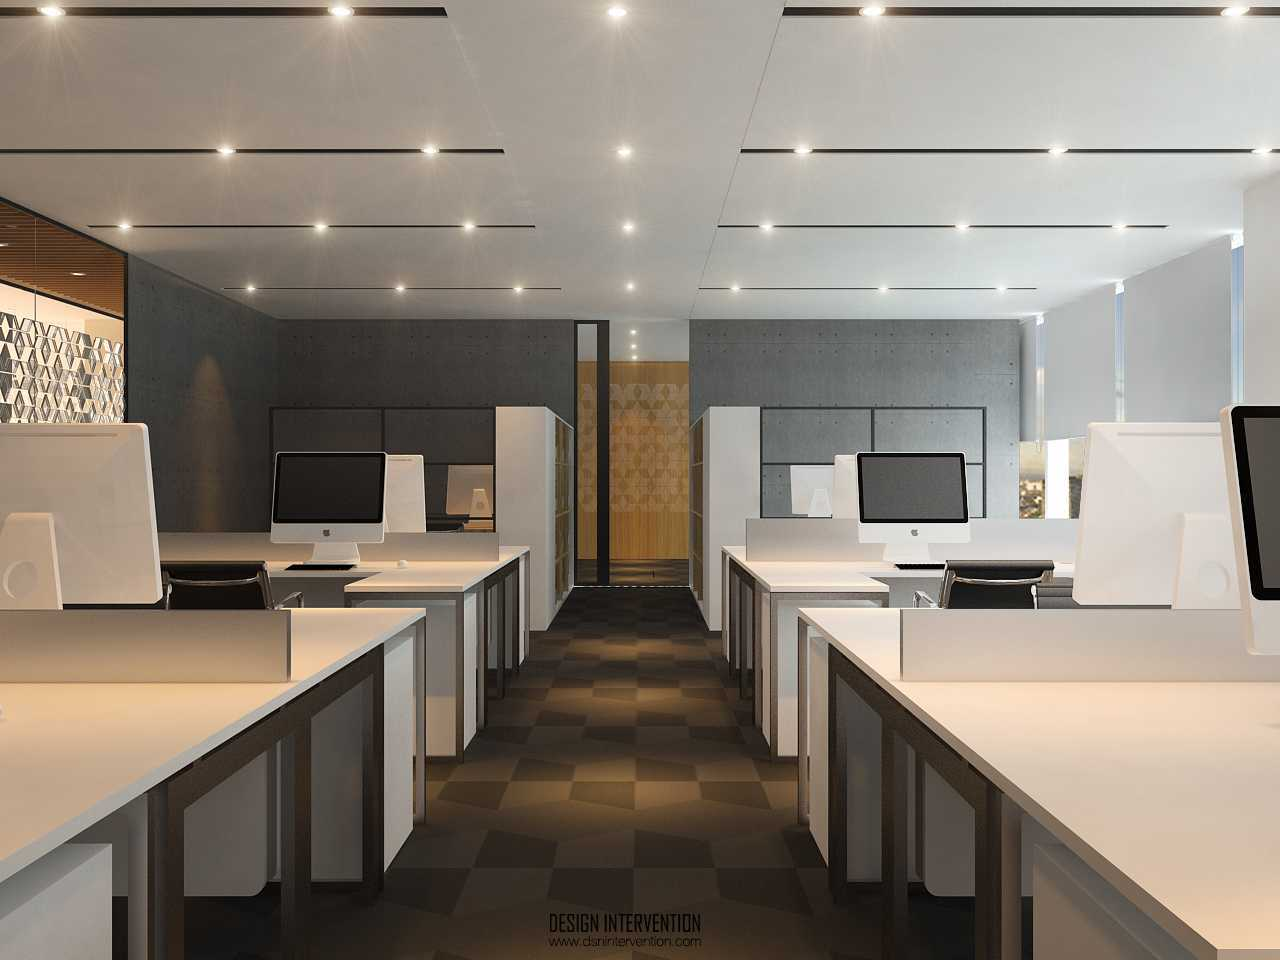 Design Intervention Mitsubishi Hq Office Tebet Tebet General-Working-Area-View  14979